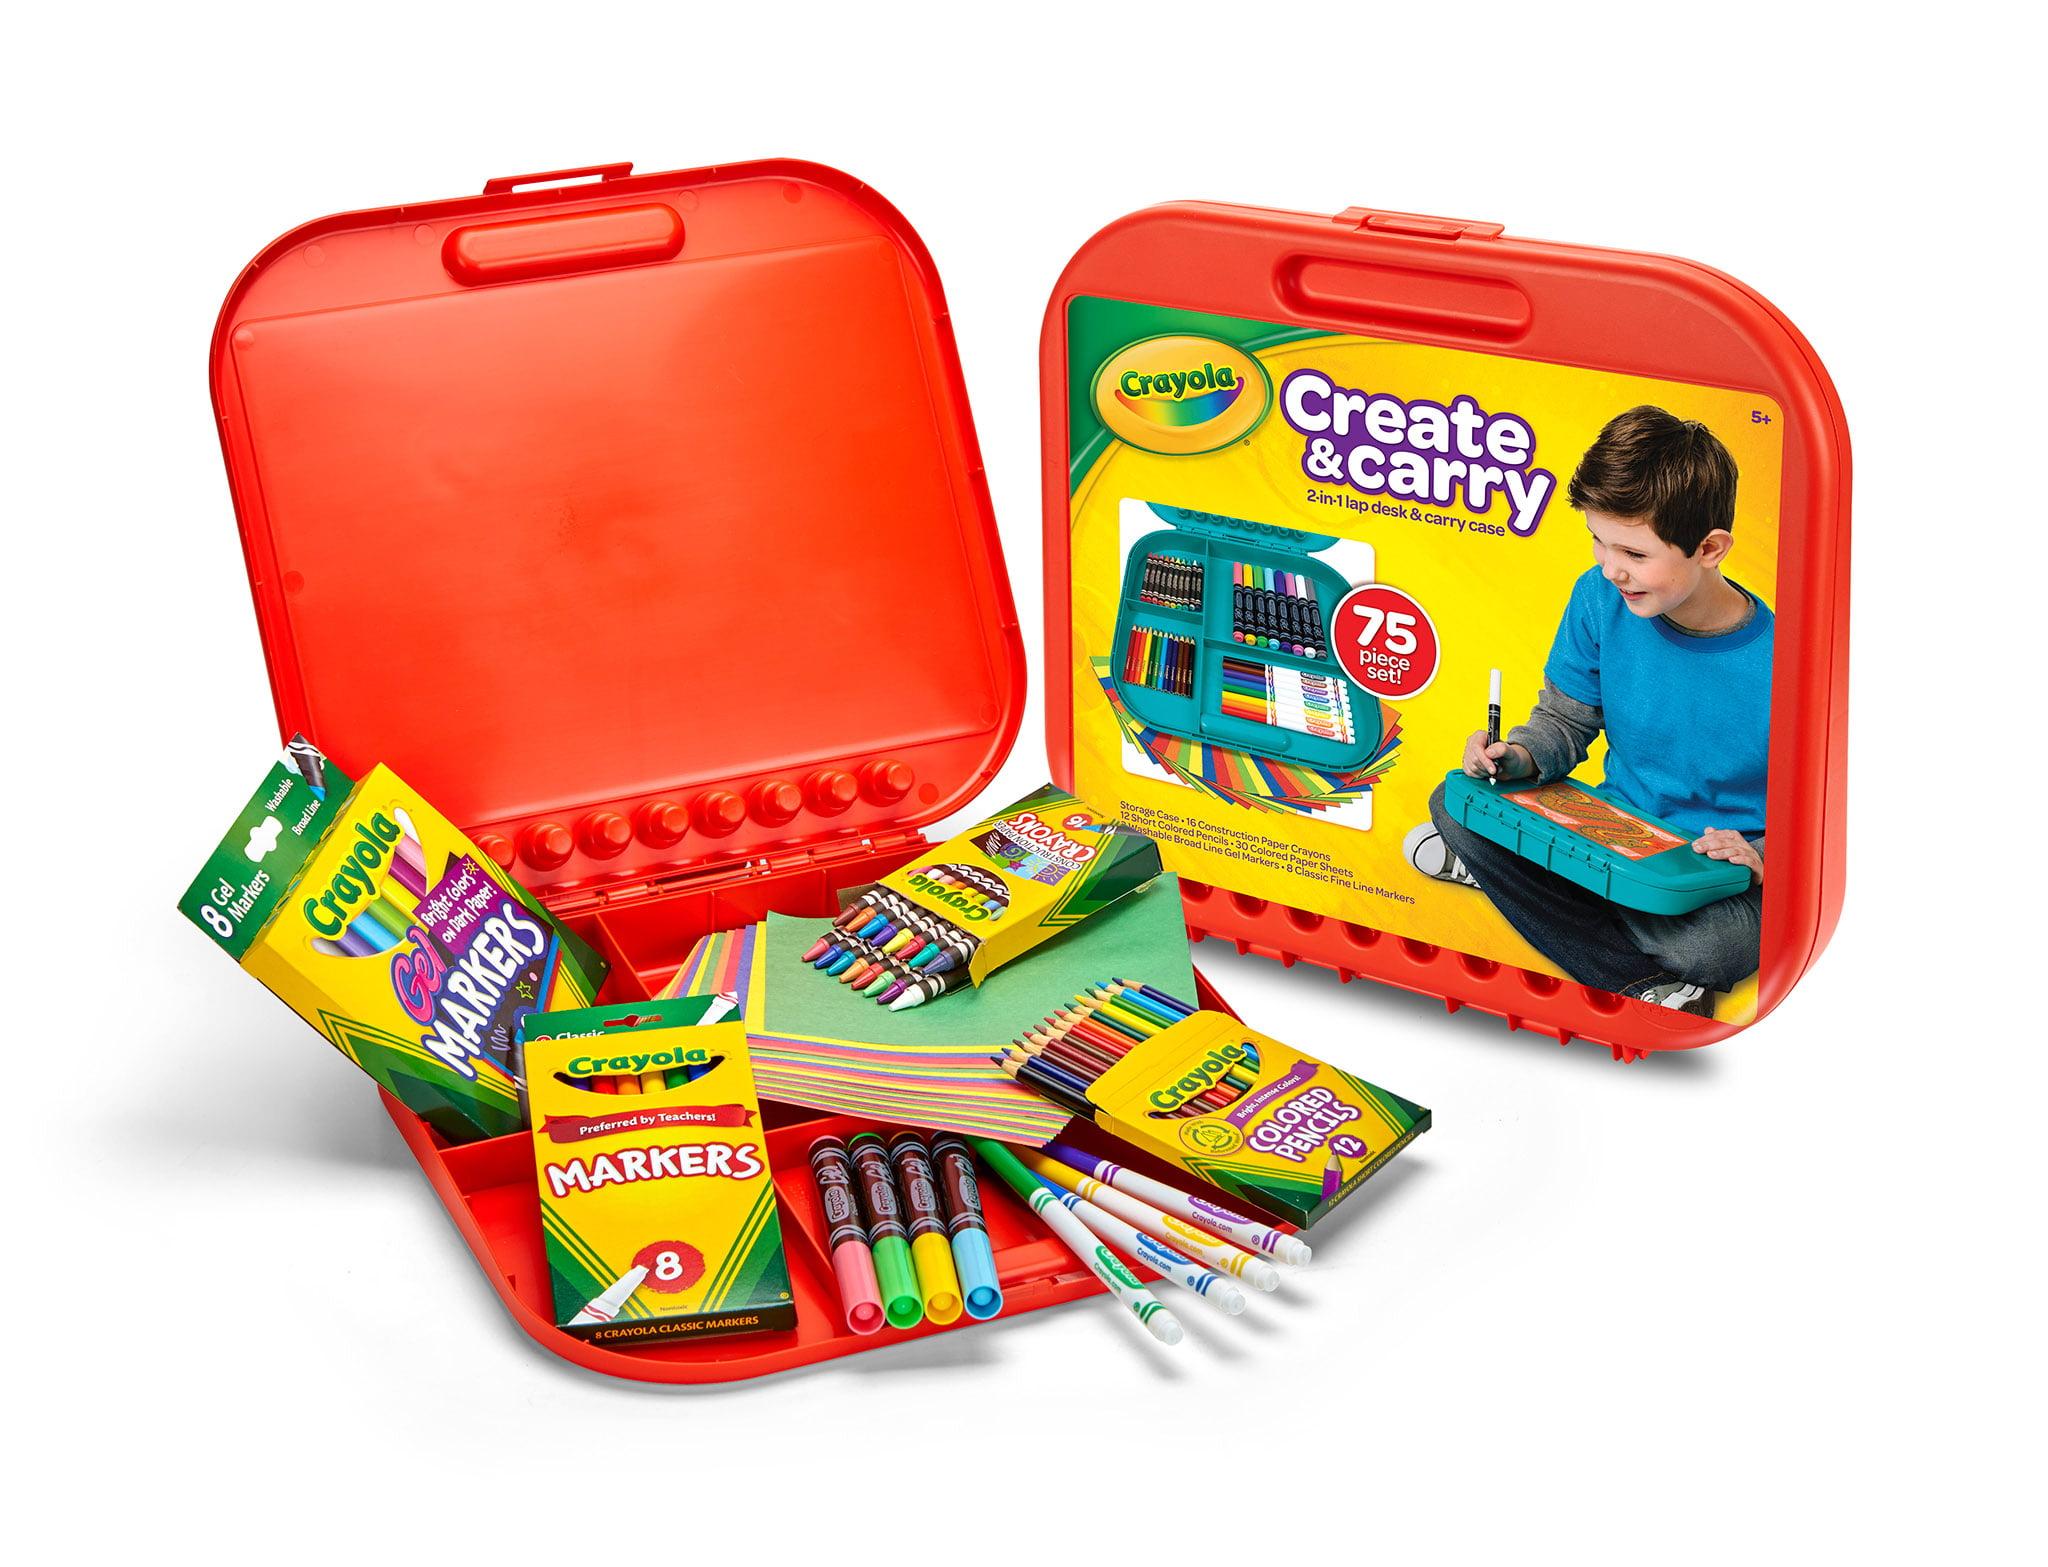 83ba04efb Crayola Create And Carry Storage Case And Lap Desk 2-N-1 - Walmart.com